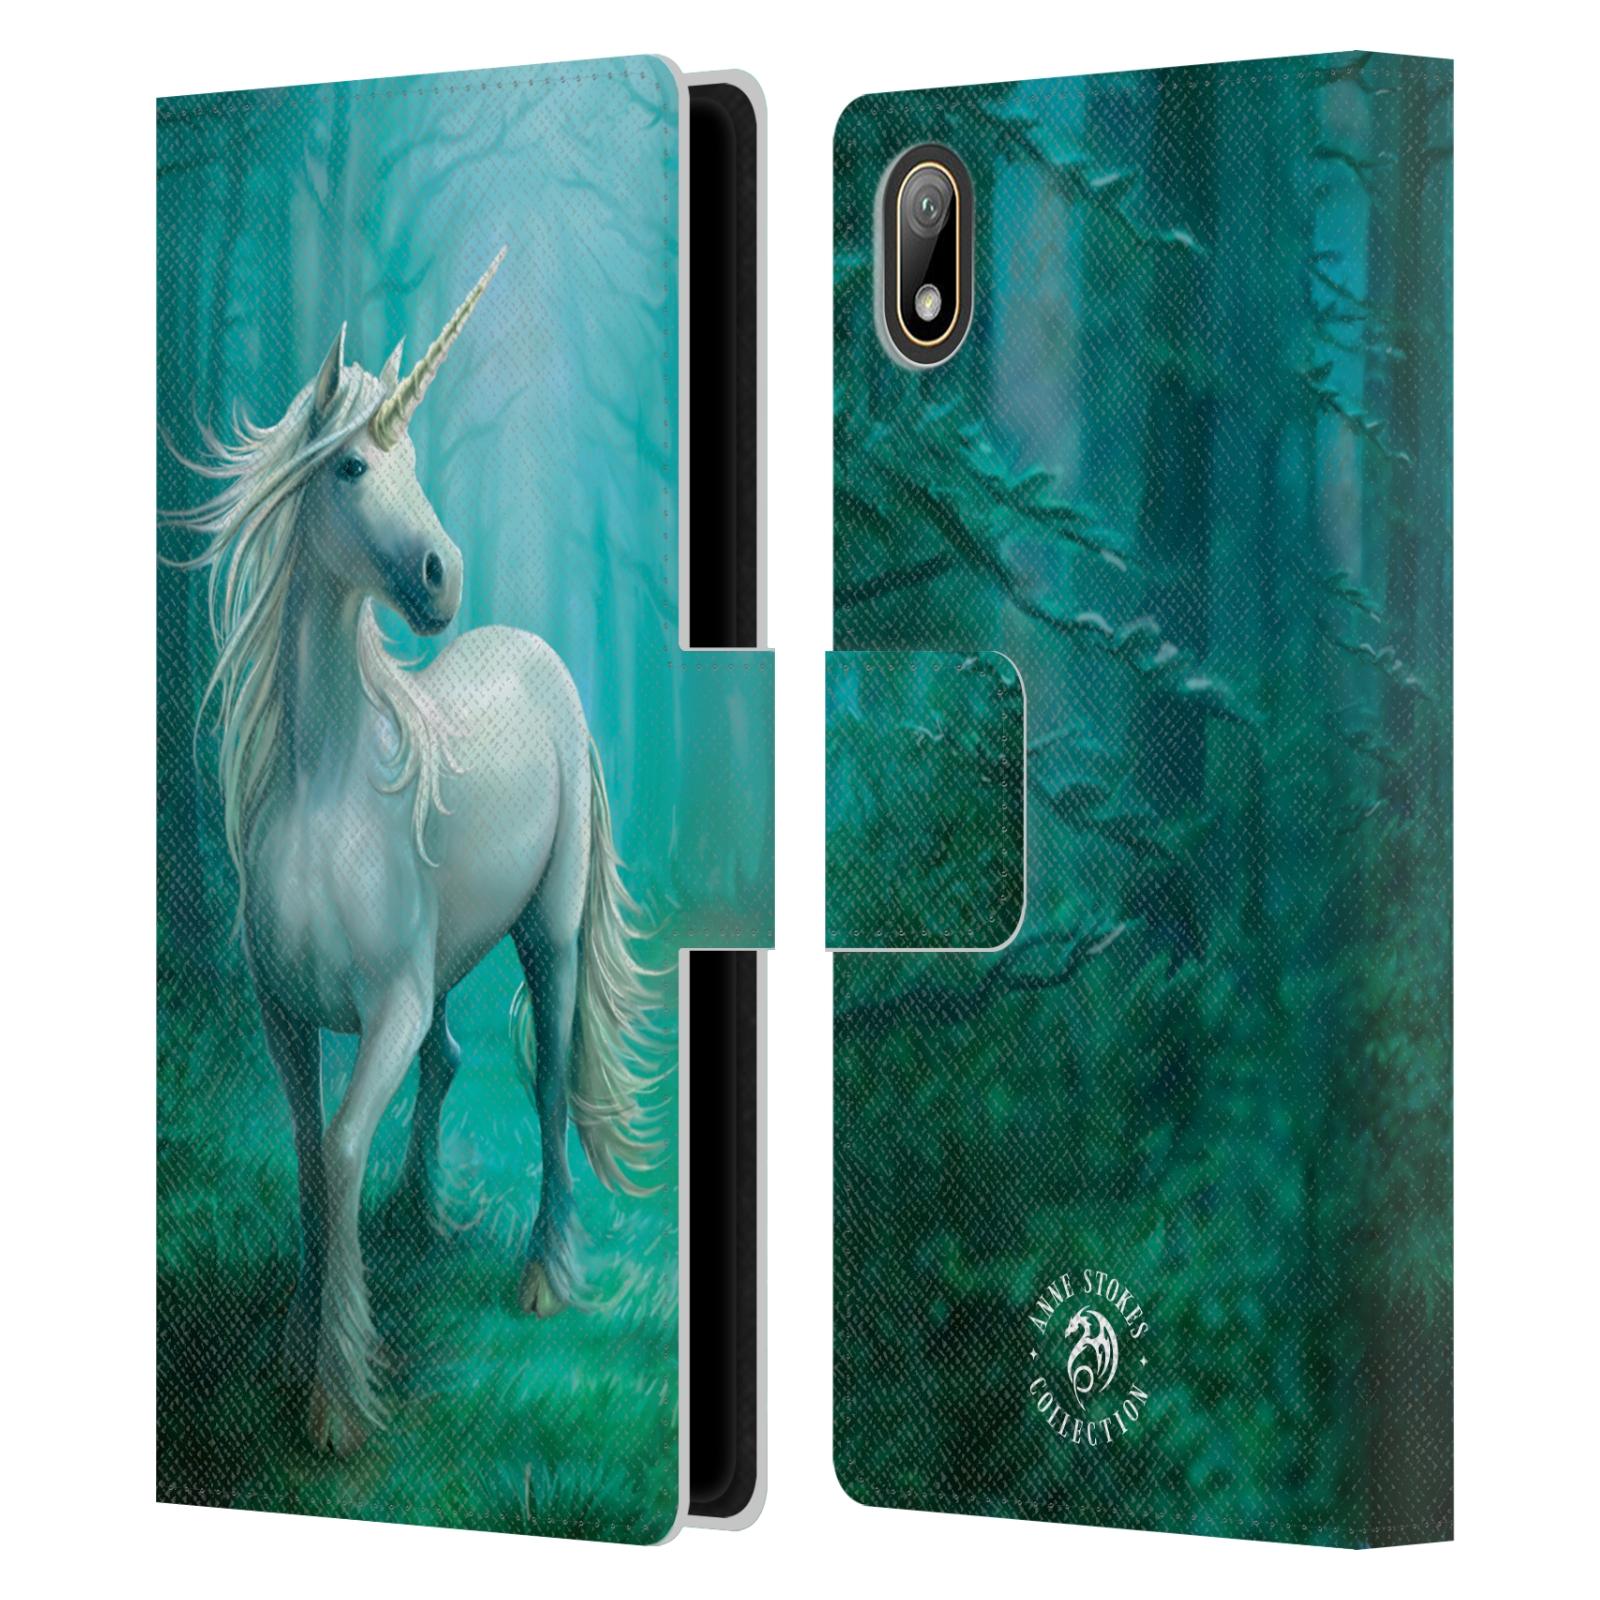 Pouzdro na mobil Huawei Y5 2019 - Head Case - fantasy - jednorožec v lese